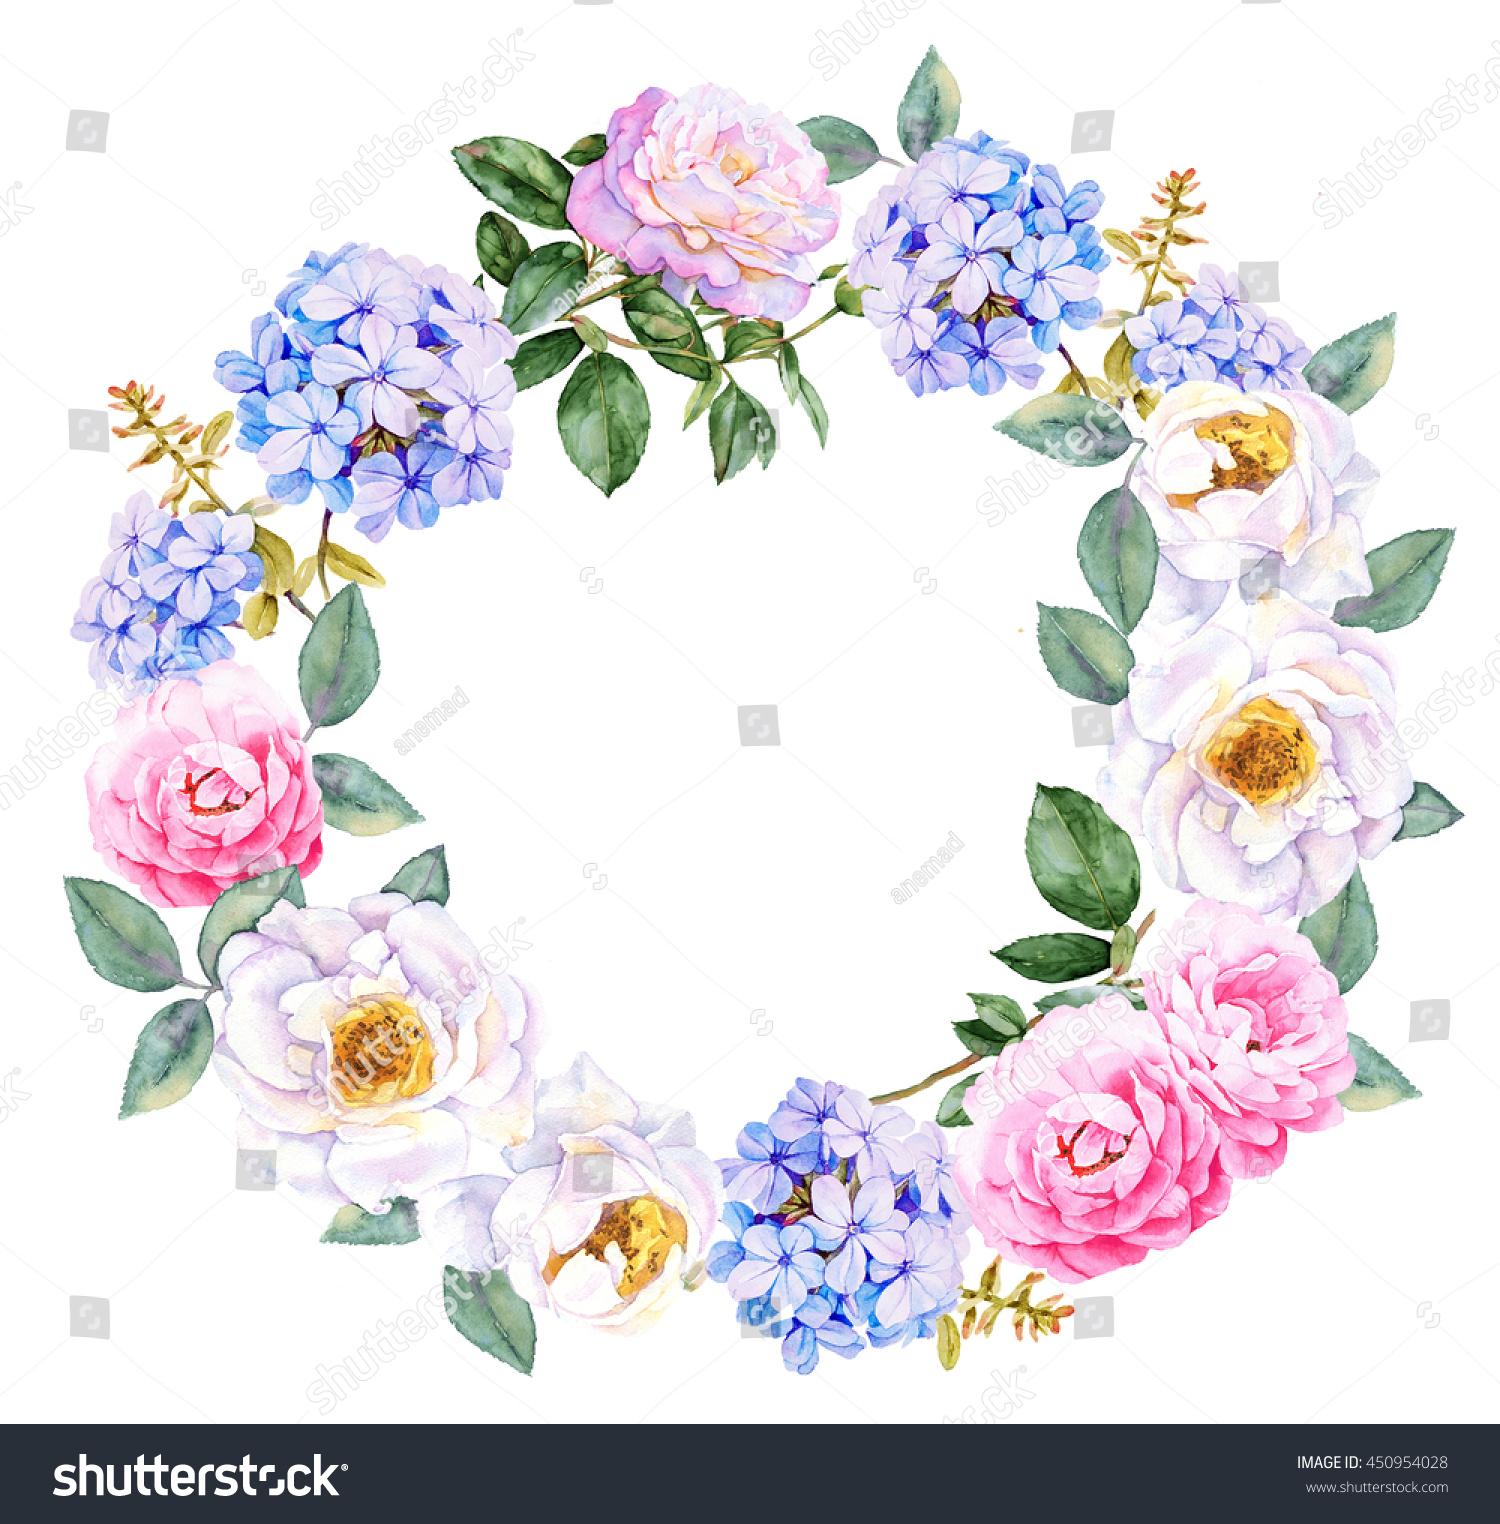 Watercolor flowers wreath roses blue jasmine stock illustration watercolor flowers wreath with roses and blue jasmine izmirmasajfo